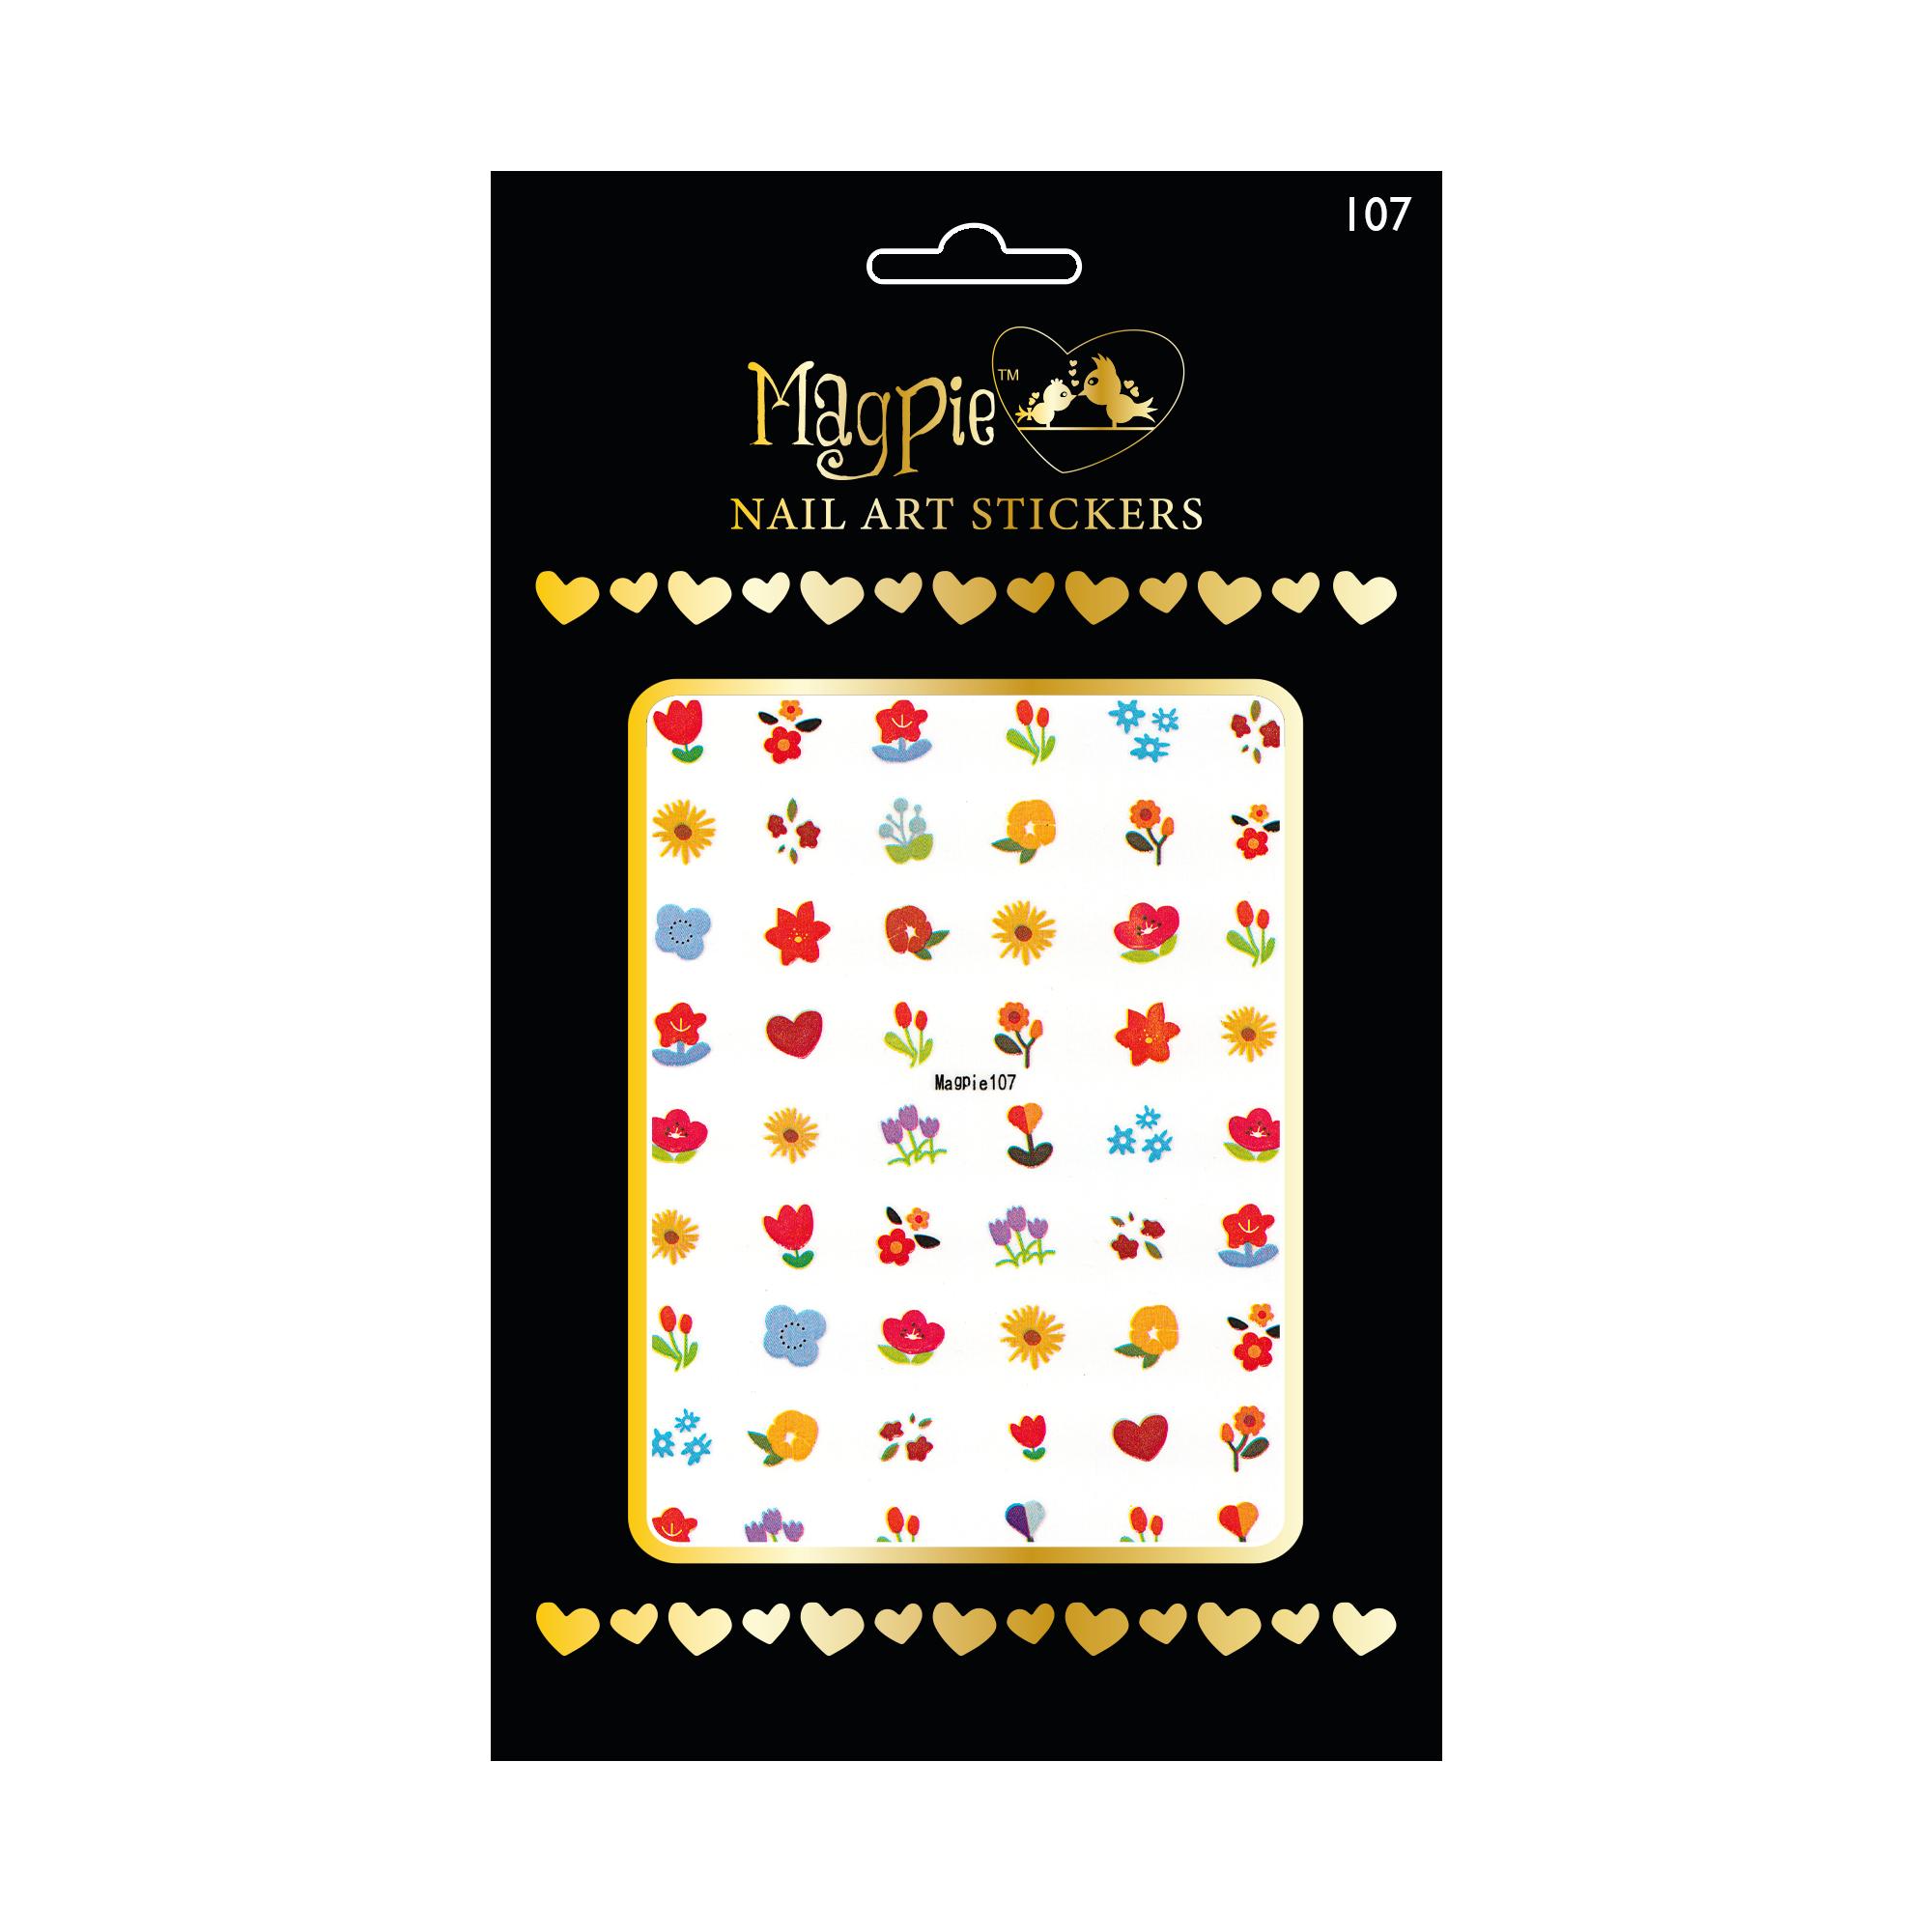 Magpie 107 stickers